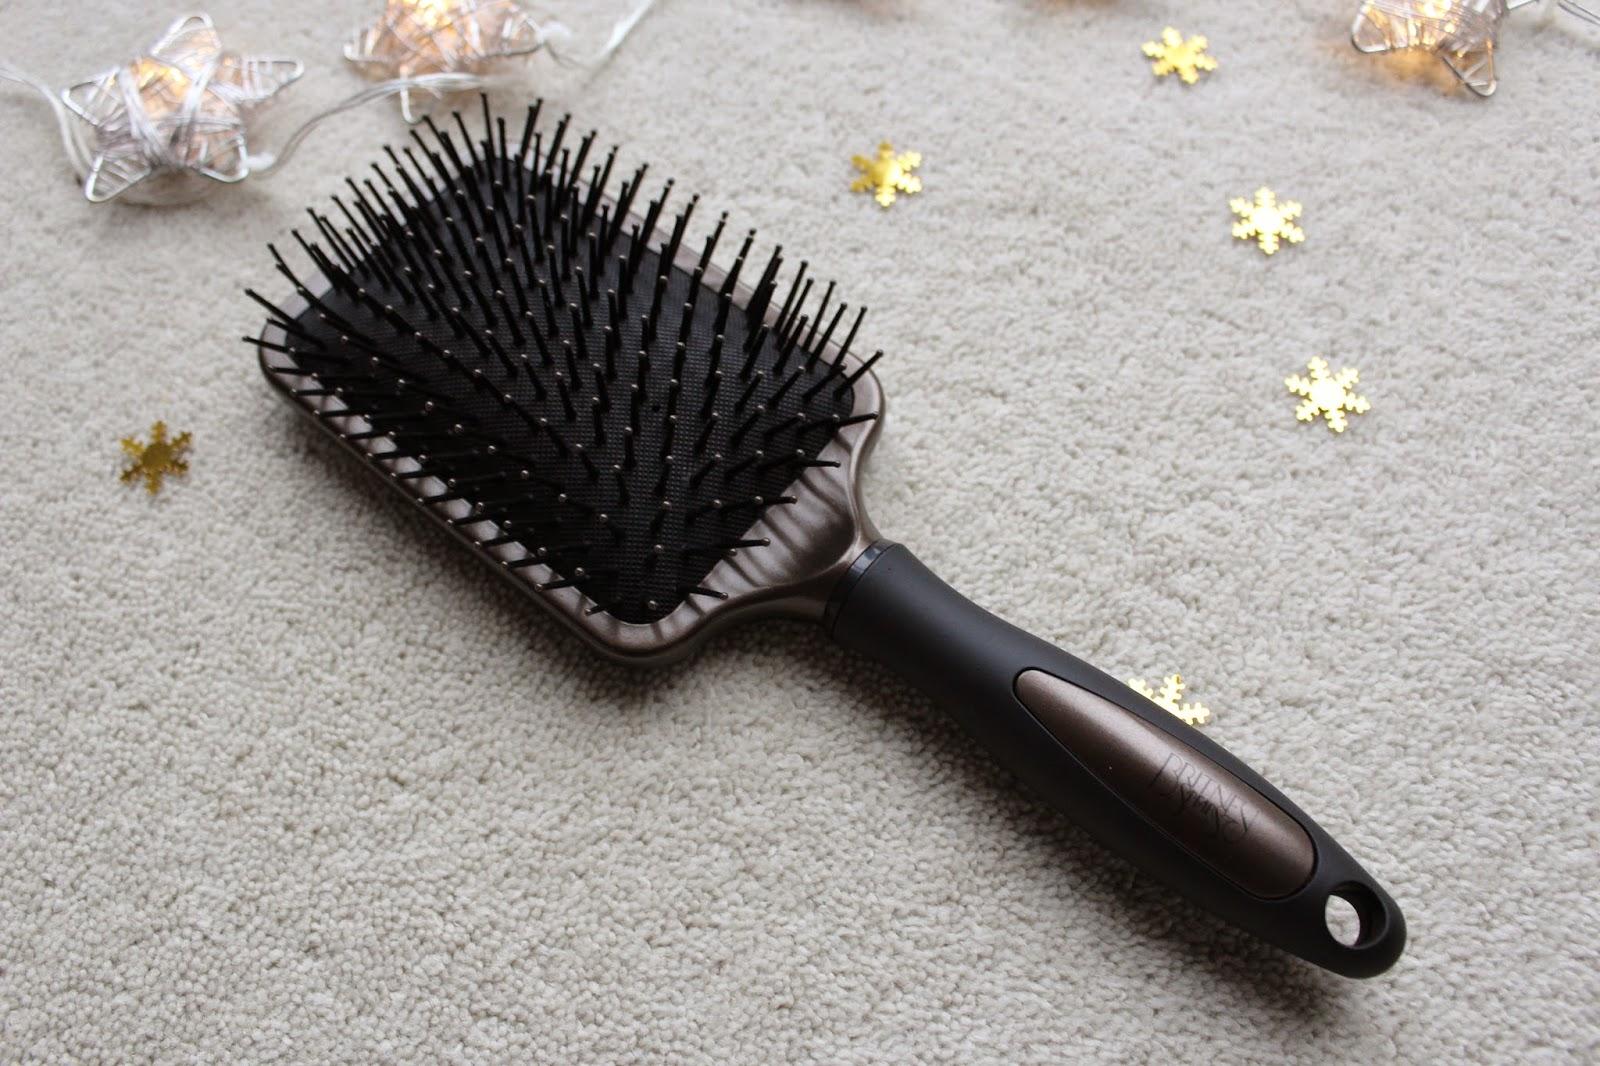 Britney-Spears-haircare-range-lidl